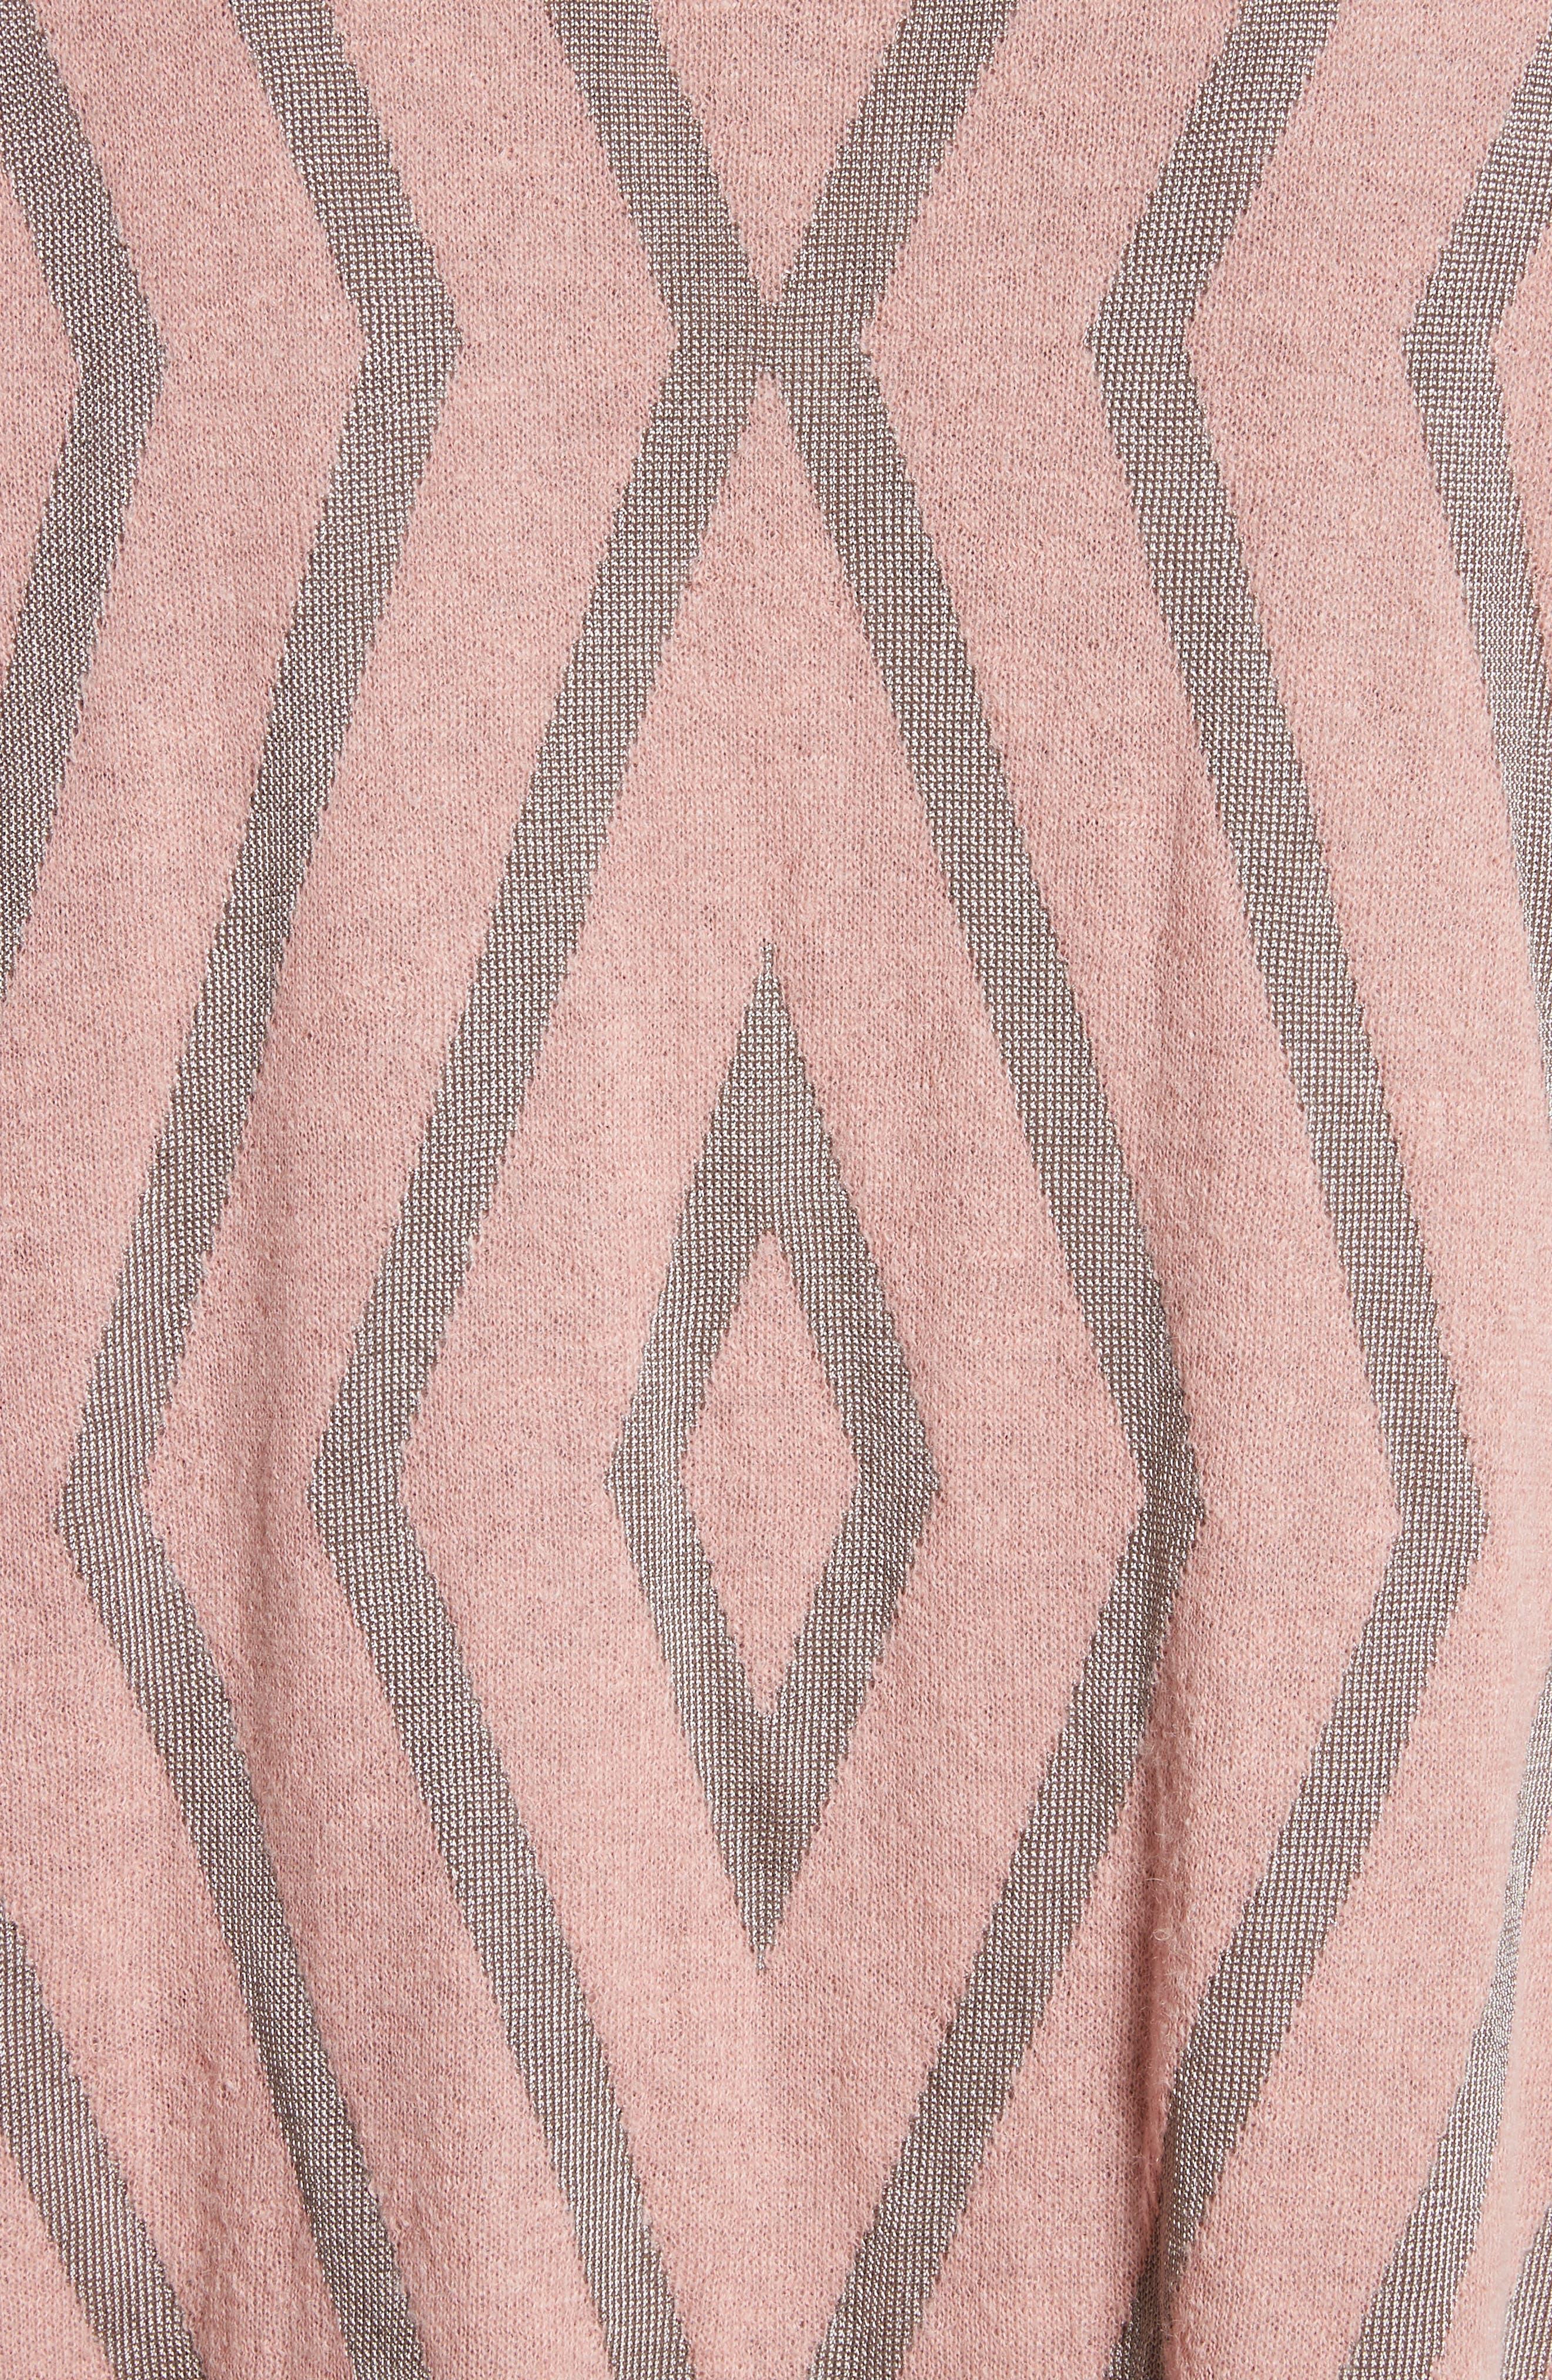 ST. JOHN COLLECTION,                             Matte Shine Geo Jacquard Knit Cardigan,                             Alternate thumbnail 5, color,                             680